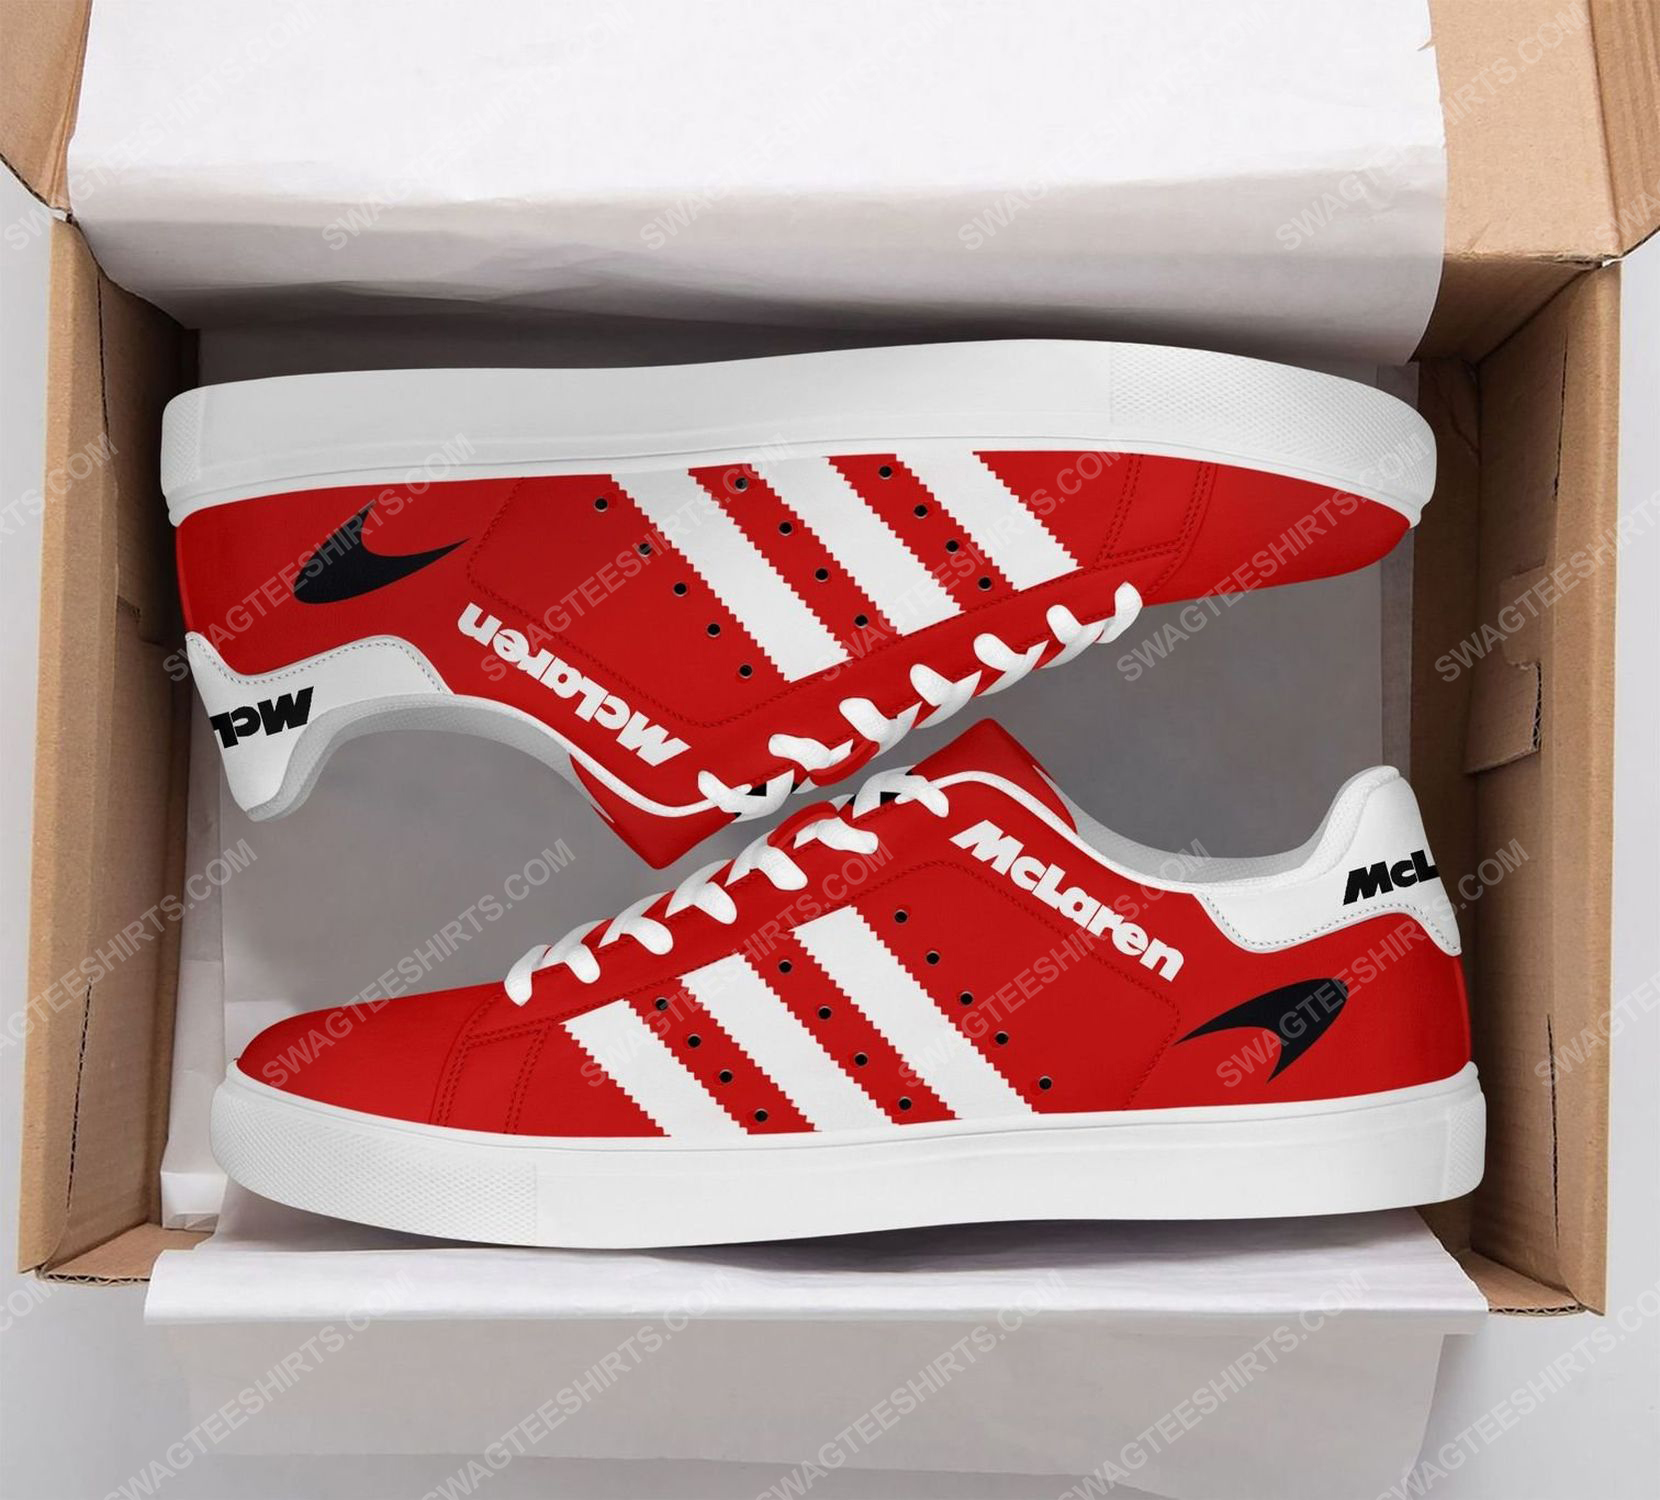 Mclaren automotive racing version red stan smith shoes 2